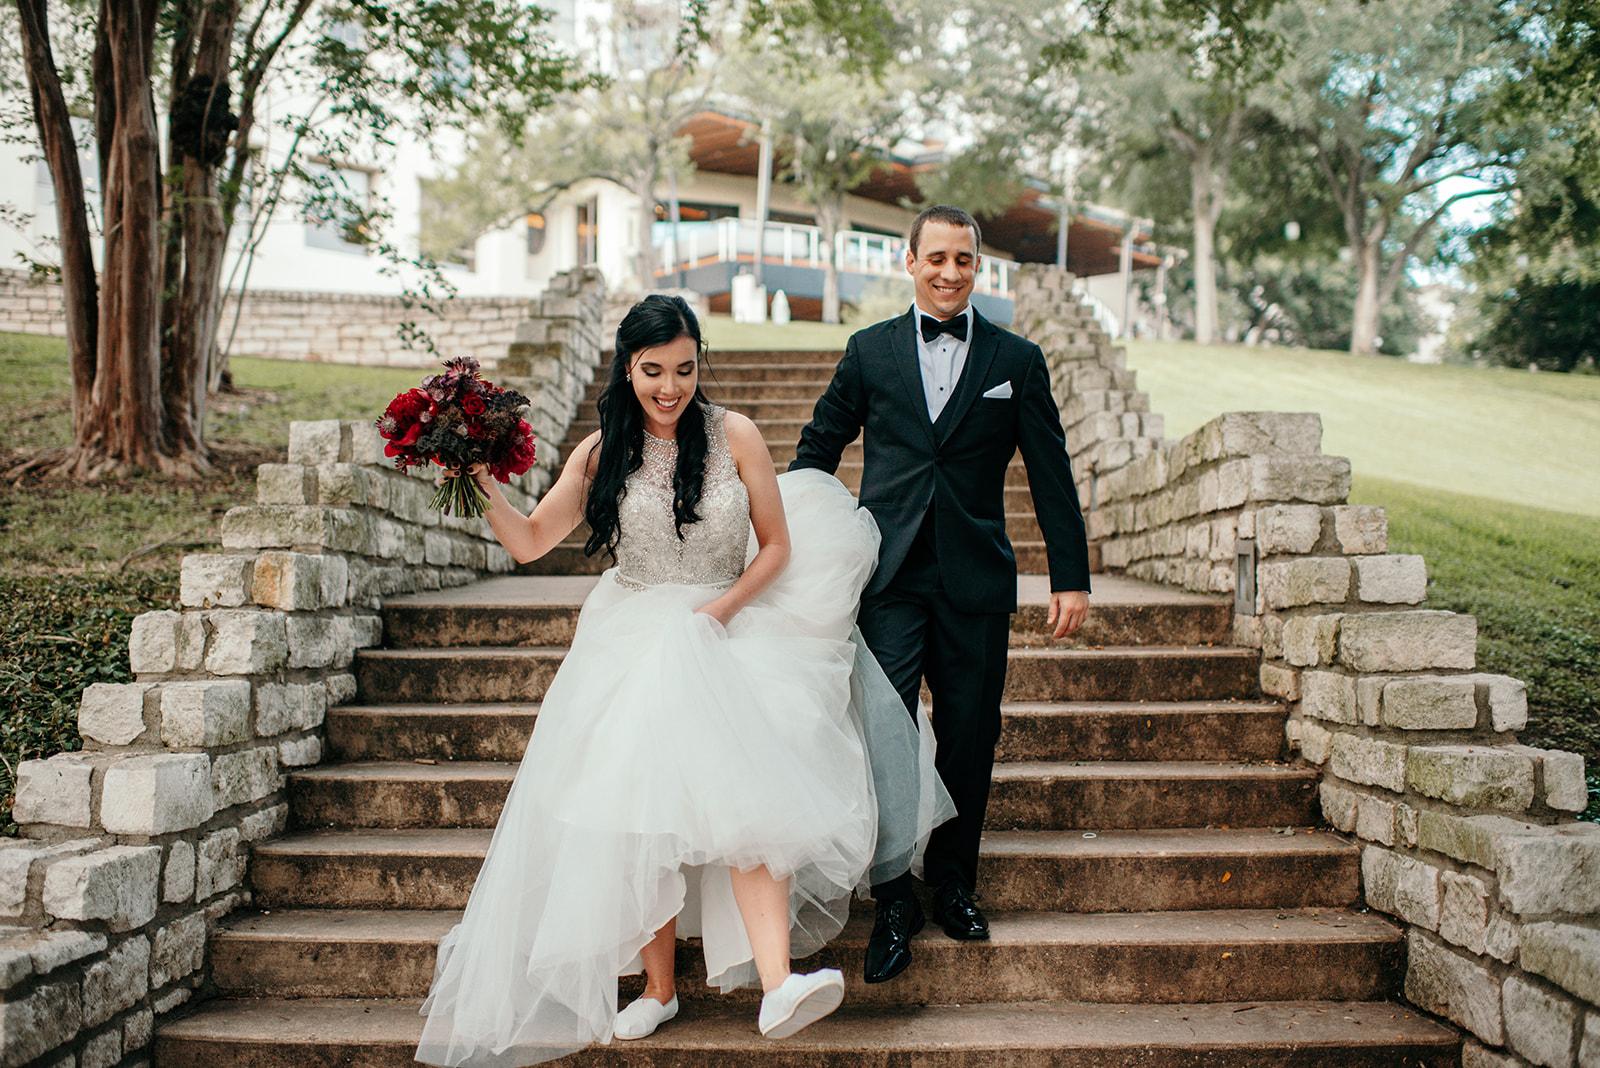 downtown-austin-wedding-bouquet.jpg